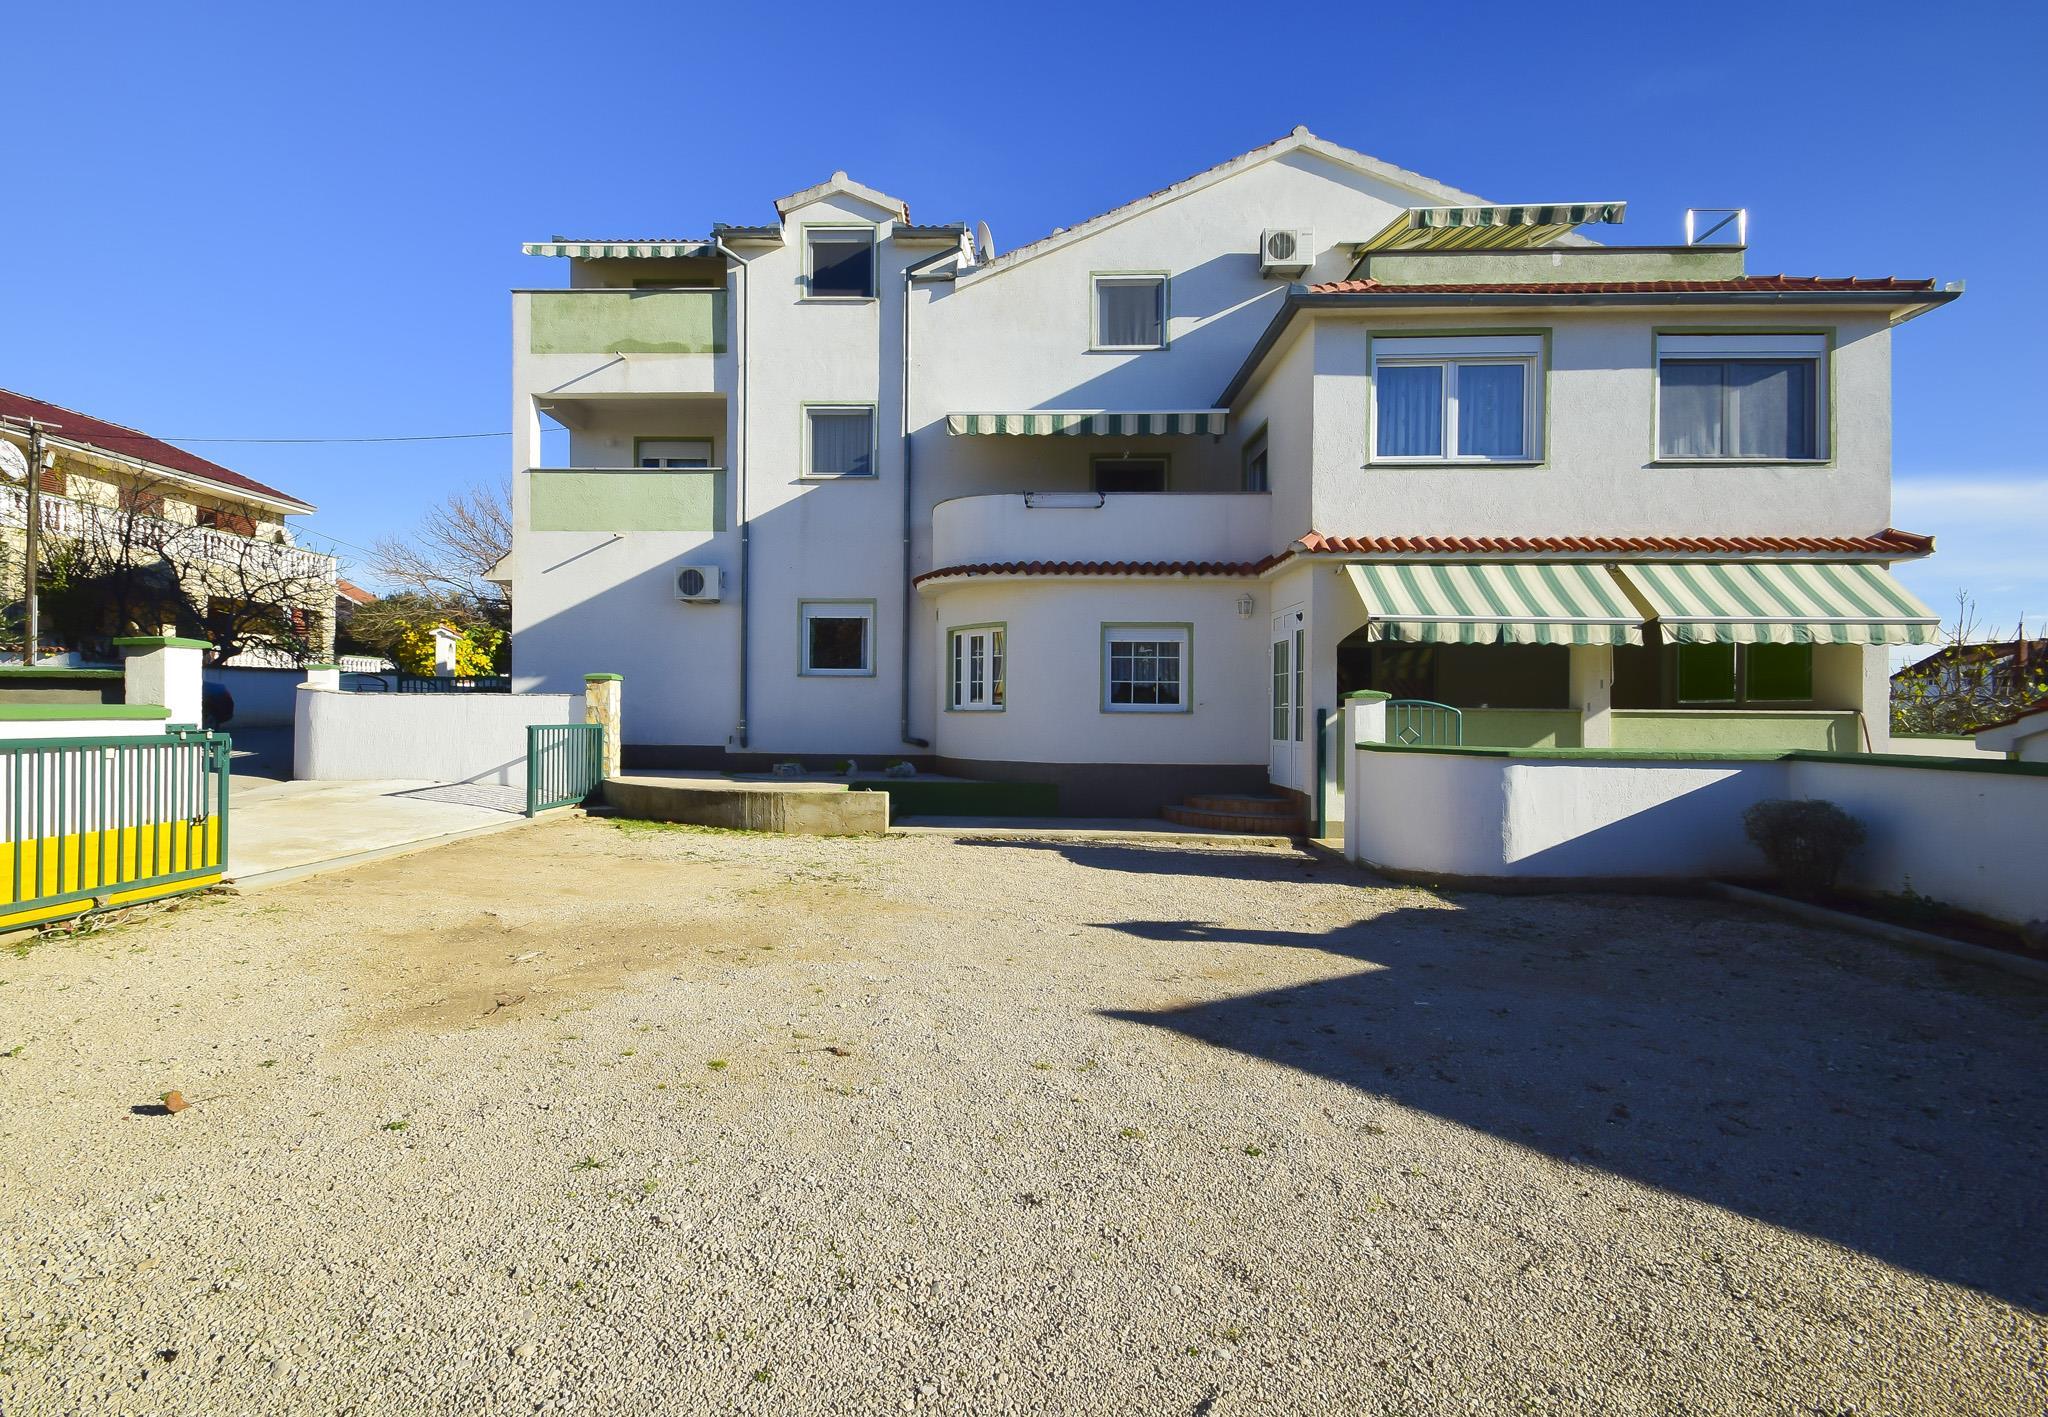 Ferienwohnung Apartments Sanja / Two bedrooms A6 (1928313), Vodice, , Dalmatien, Kroatien, Bild 10